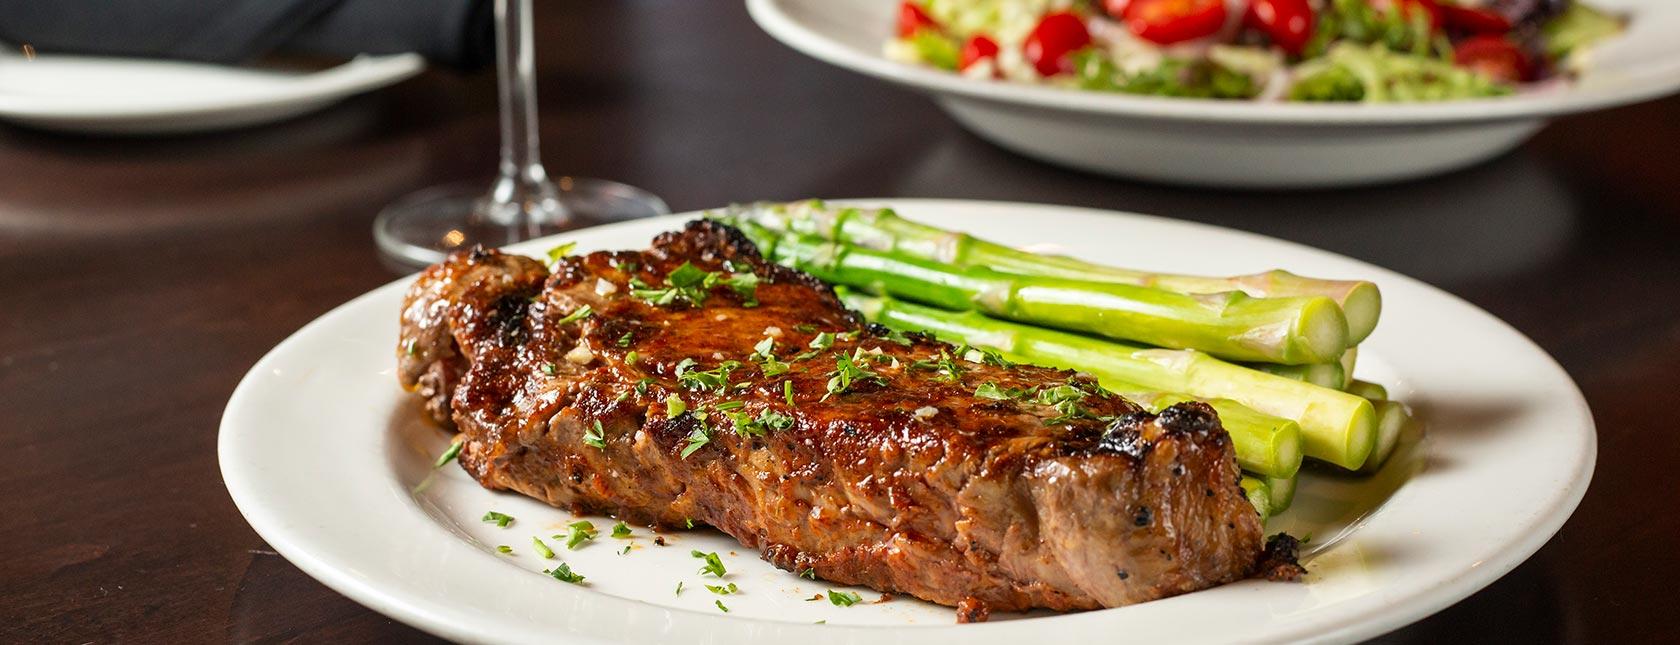 New York Strip Steak with asparagus, salad in background